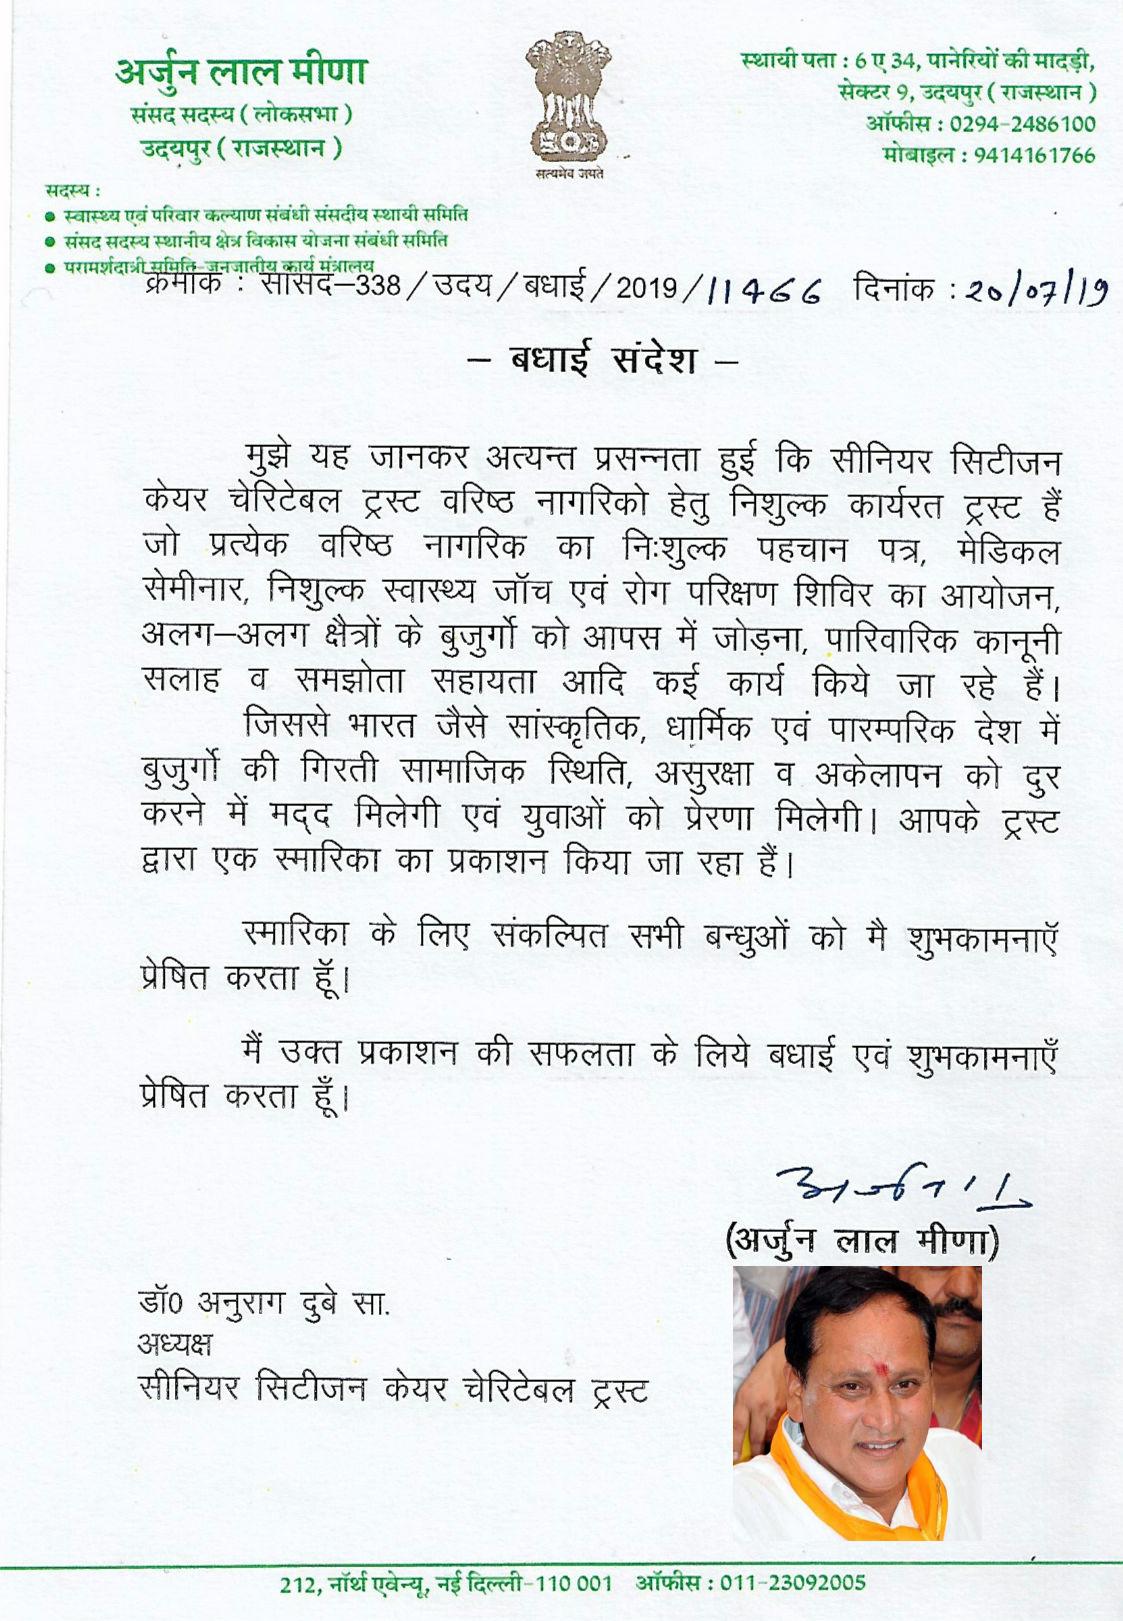 Shri Arjun Lal Meena